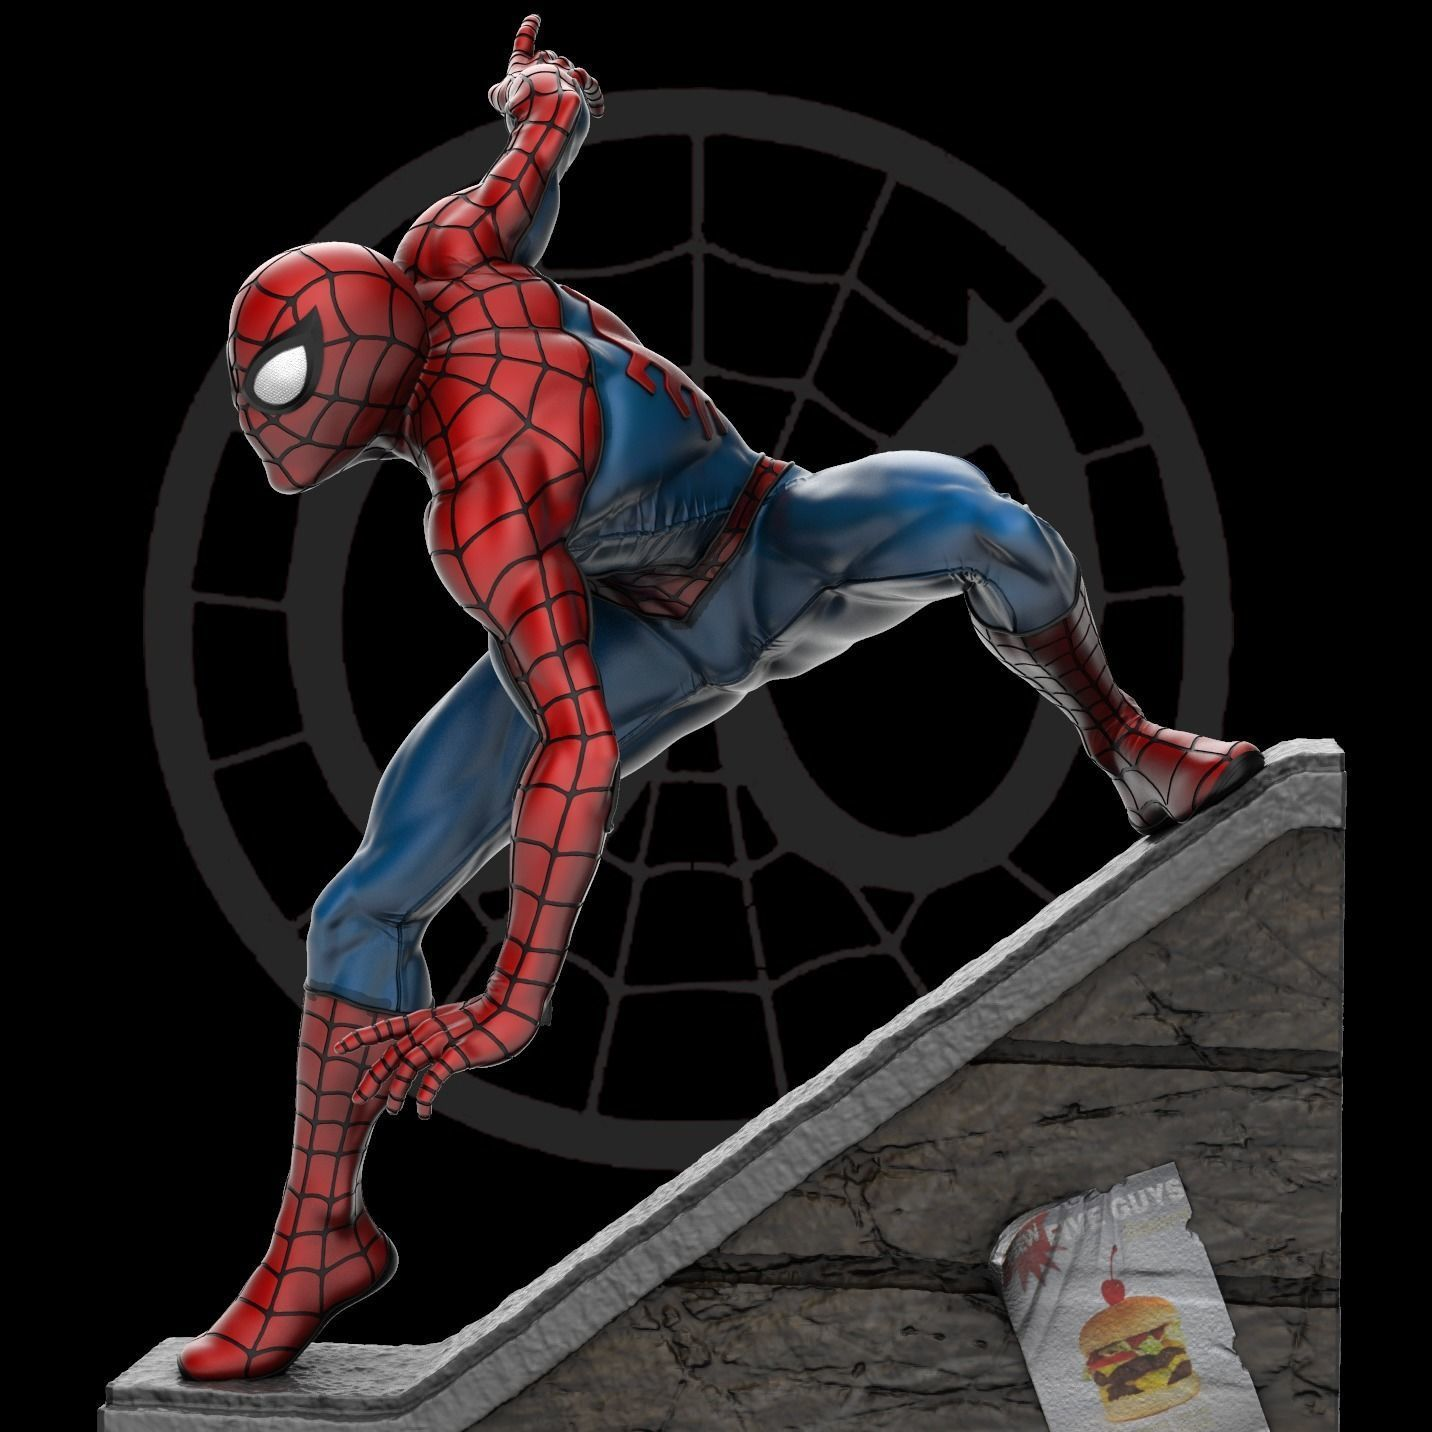 Spider-Man Statue 3D Print Ready